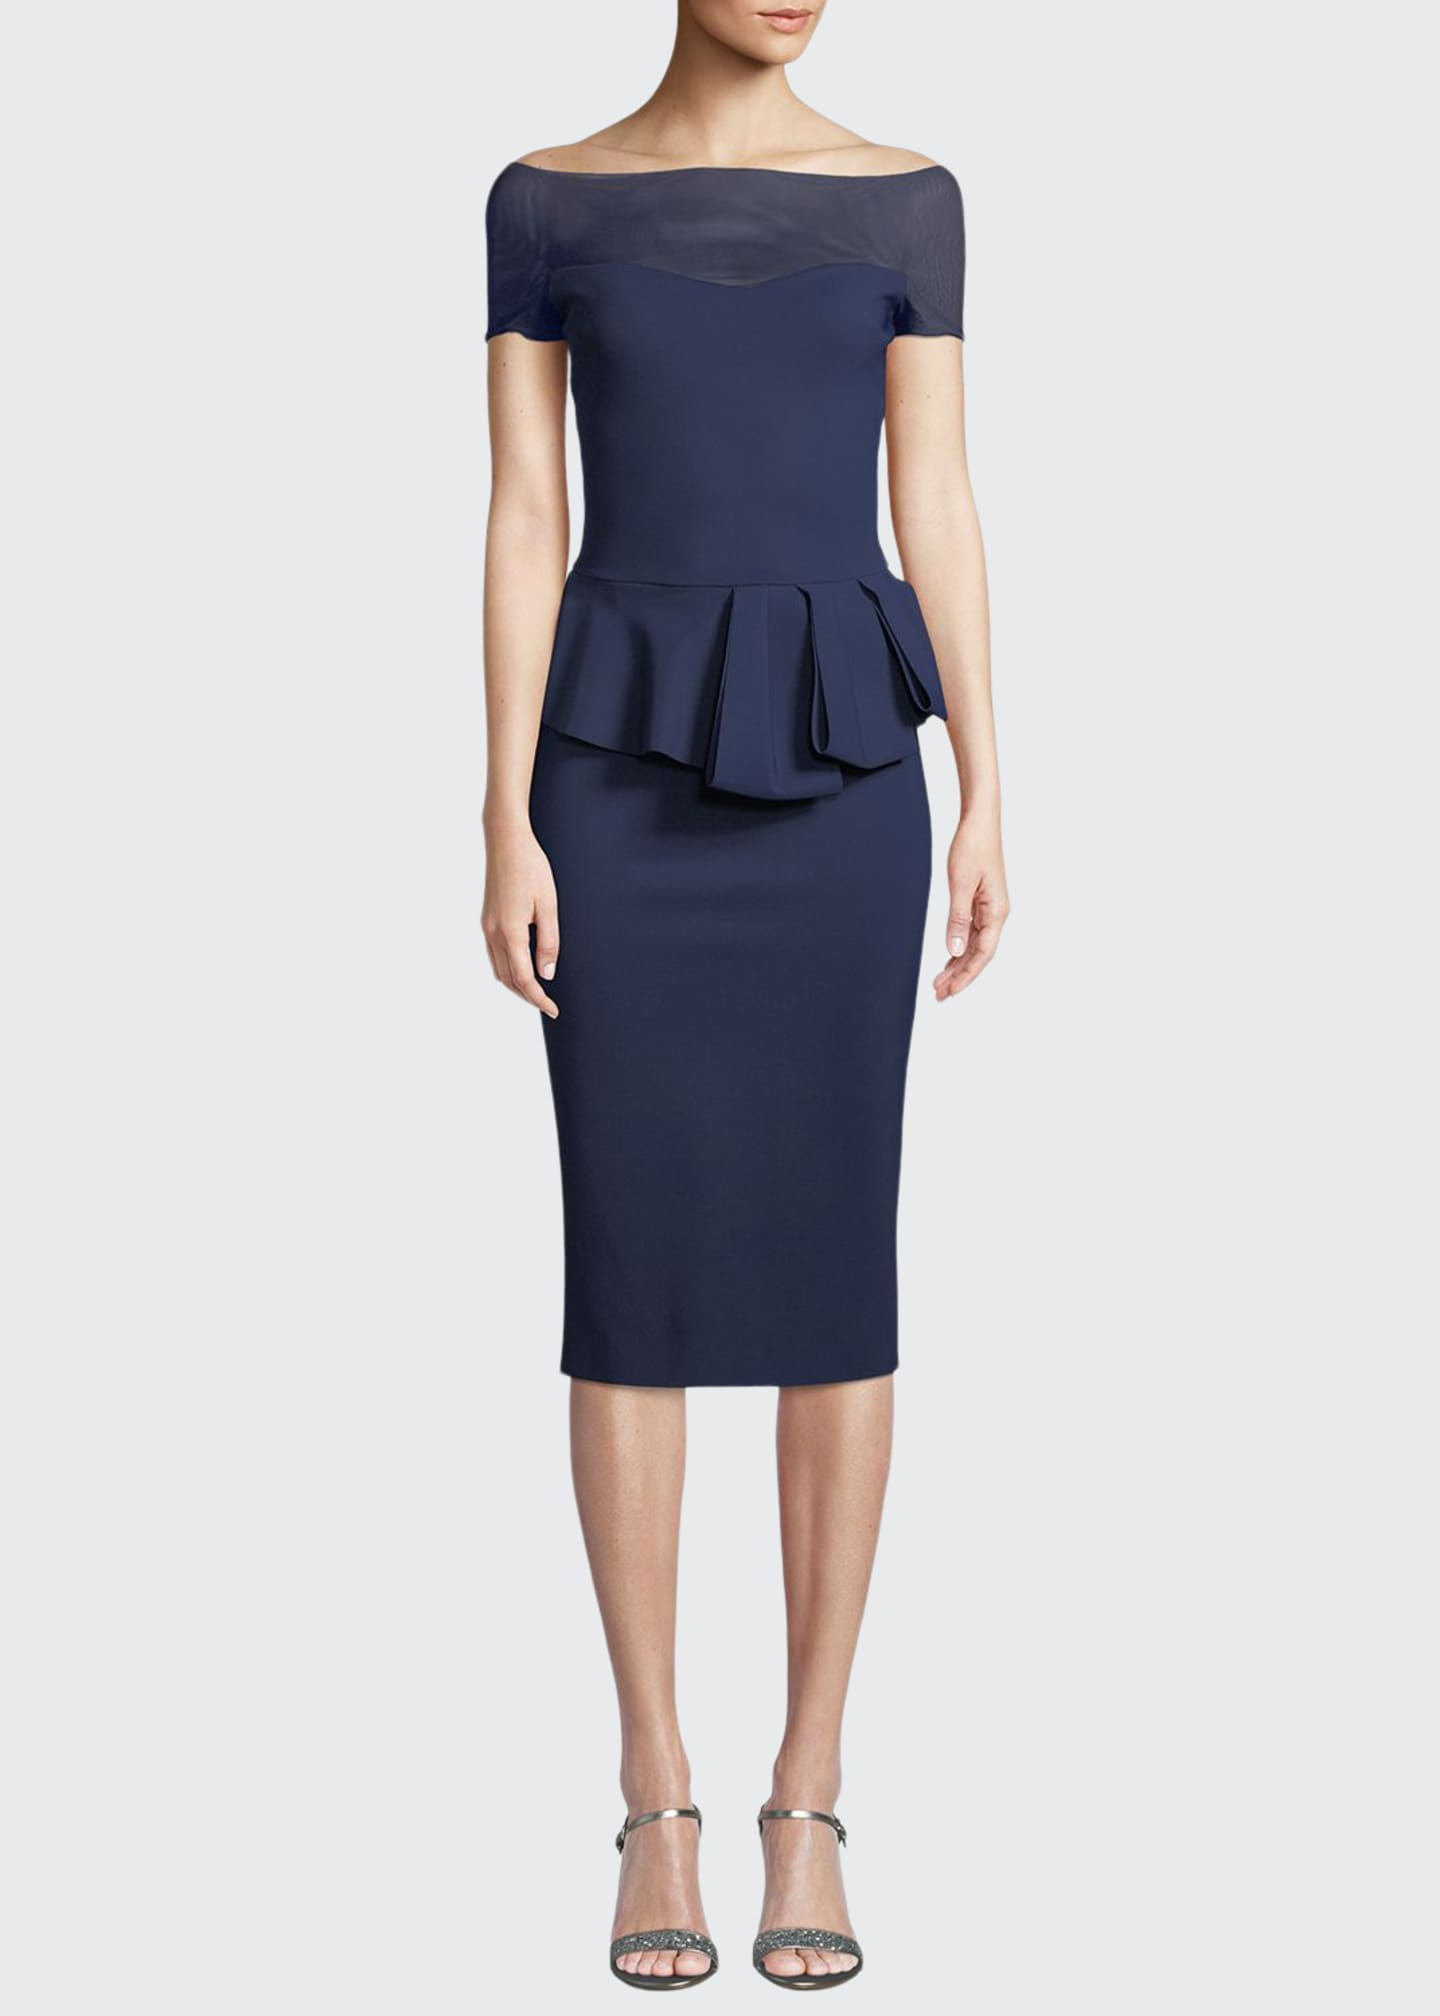 Chiara Boni La Petite Robe Nabelle Illusion Dress